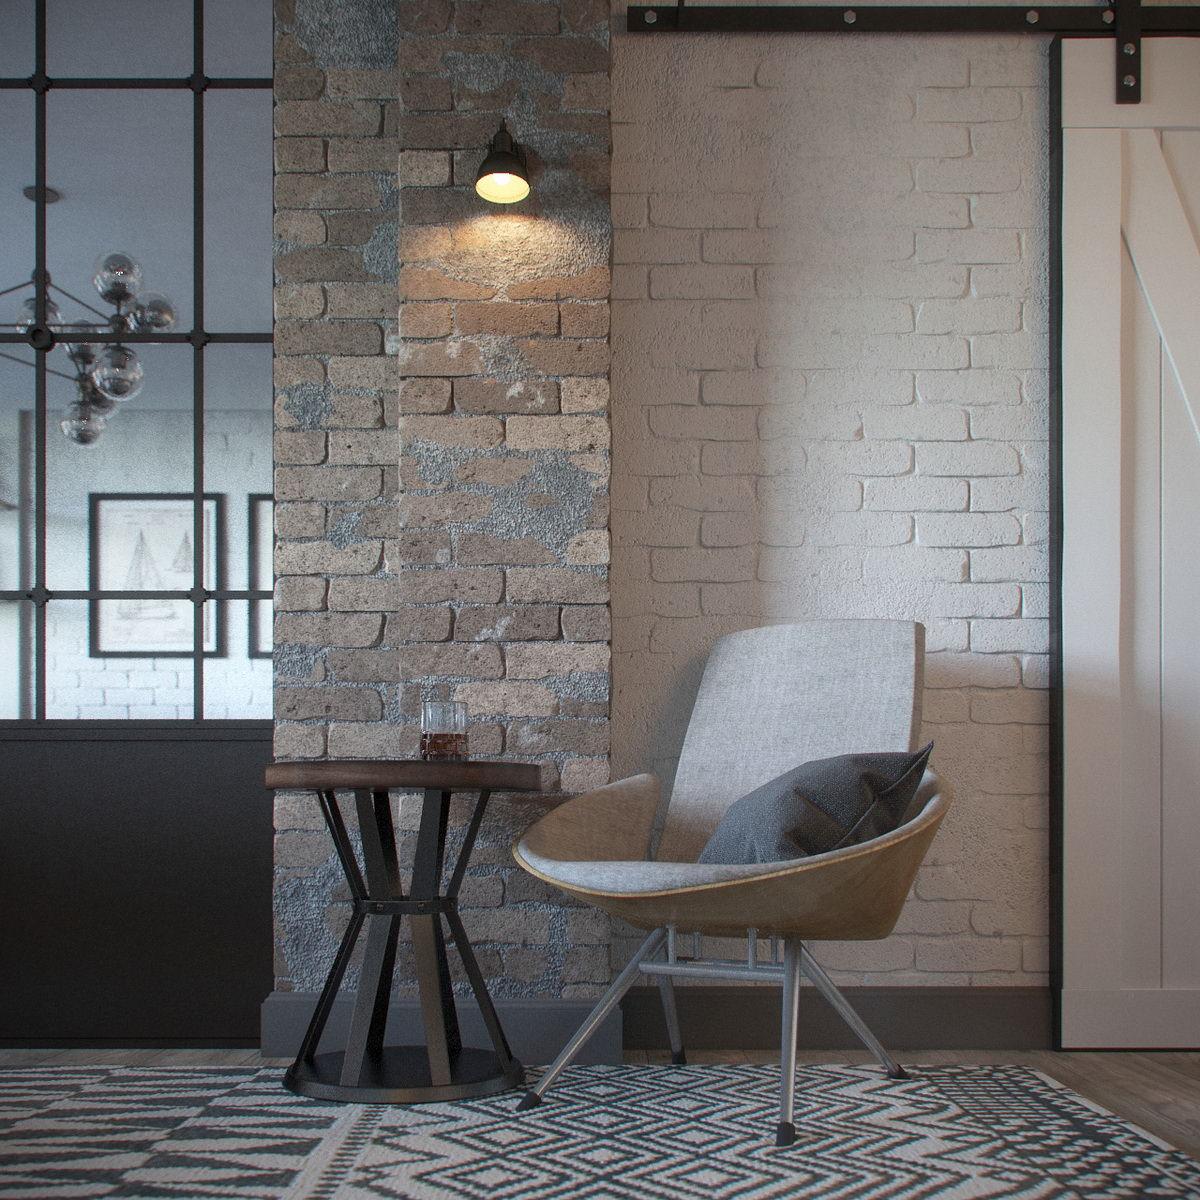 interior-3D-visualization-loft-room-mirrors-brick